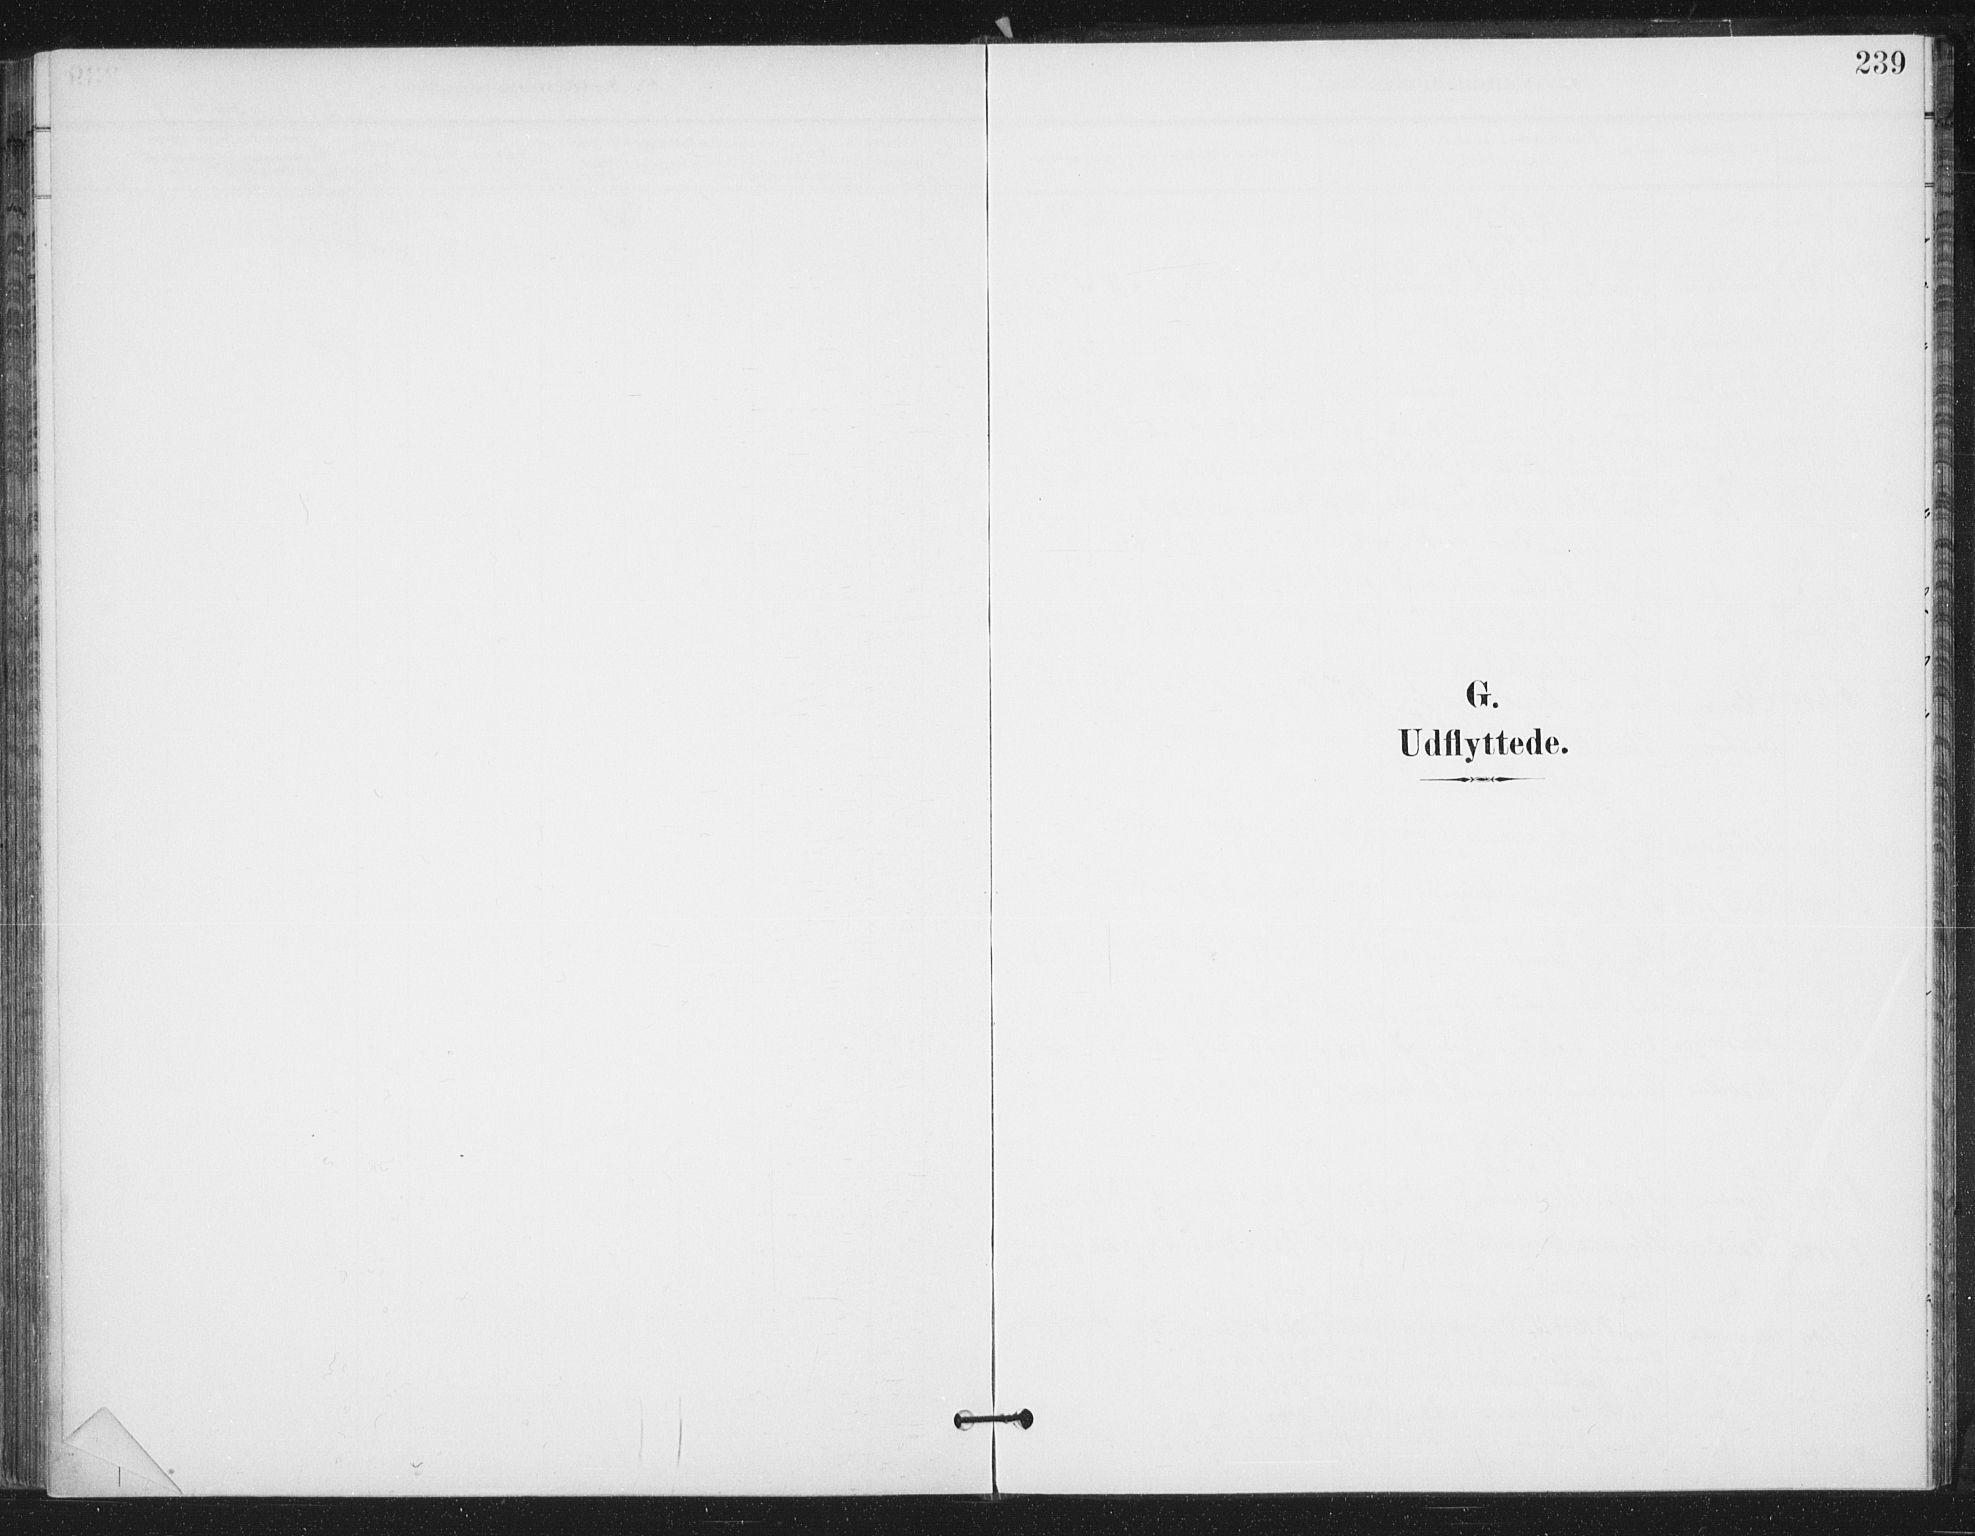 SAT, Ministerialprotokoller, klokkerbøker og fødselsregistre - Sør-Trøndelag, 658/L0723: Parish register (official) no. 658A02, 1897-1912, p. 239